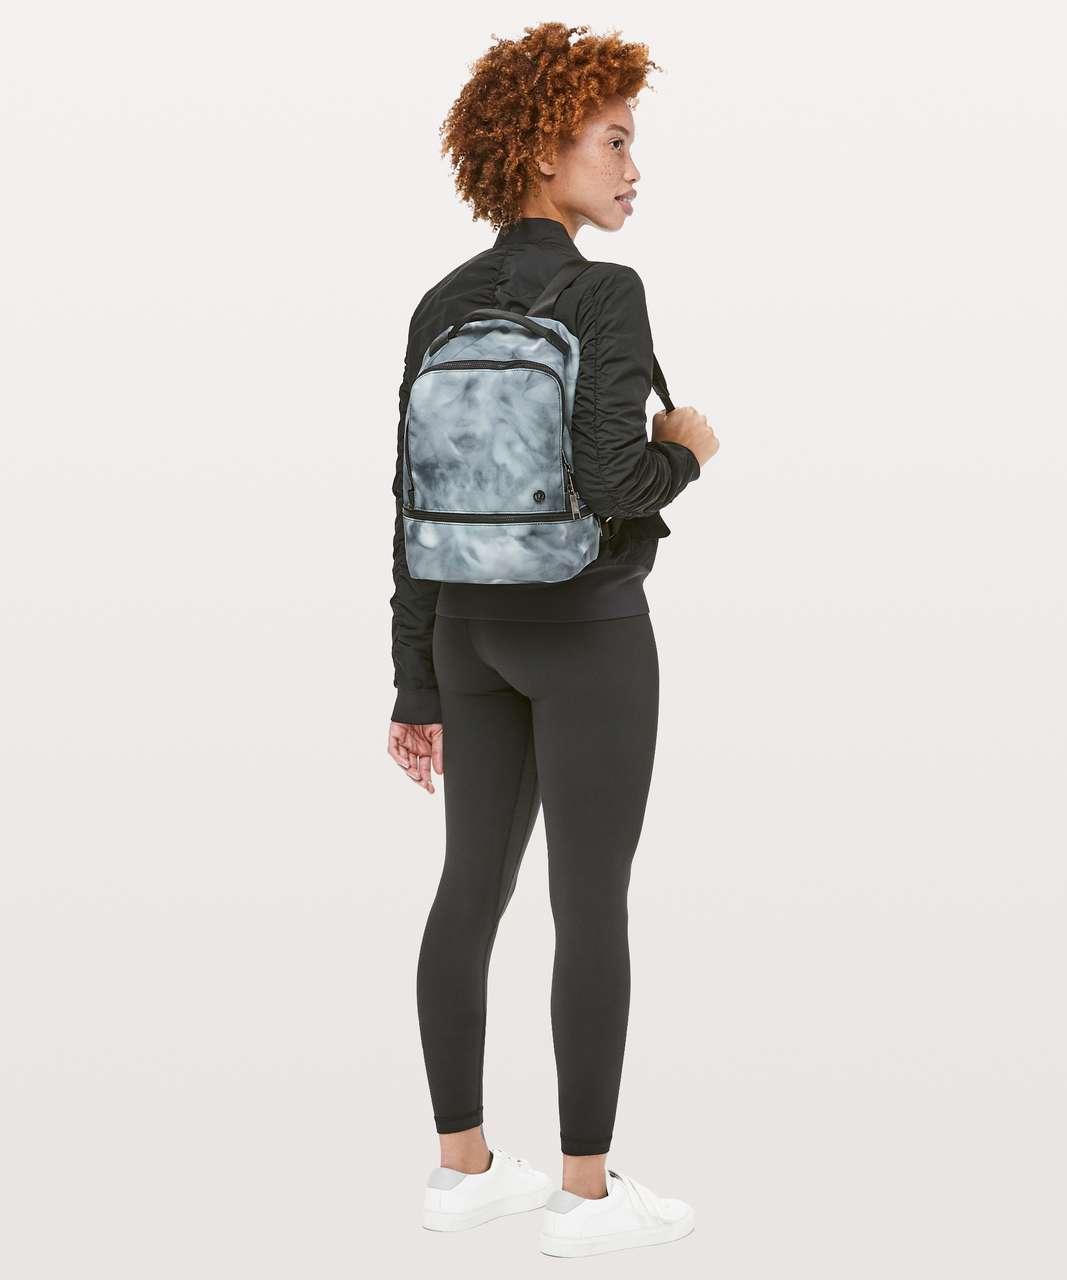 Lululemon City Adventurer Backpack Mini *10L - Spray Dye Grey Multi